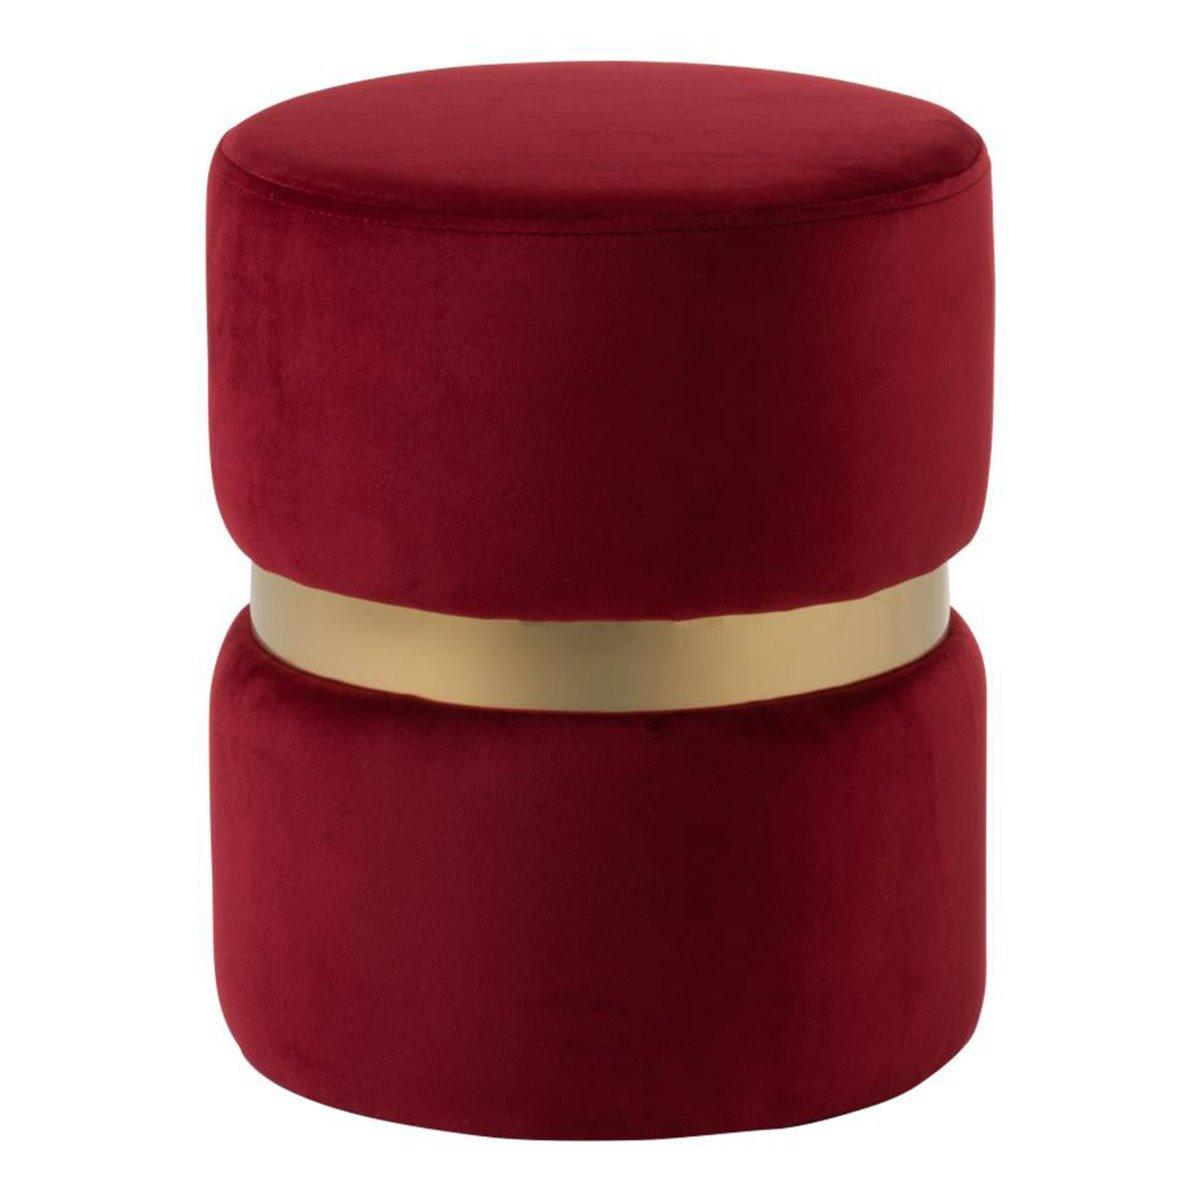 J-Line poef velours textiel rood goud 38 x 30 x 30